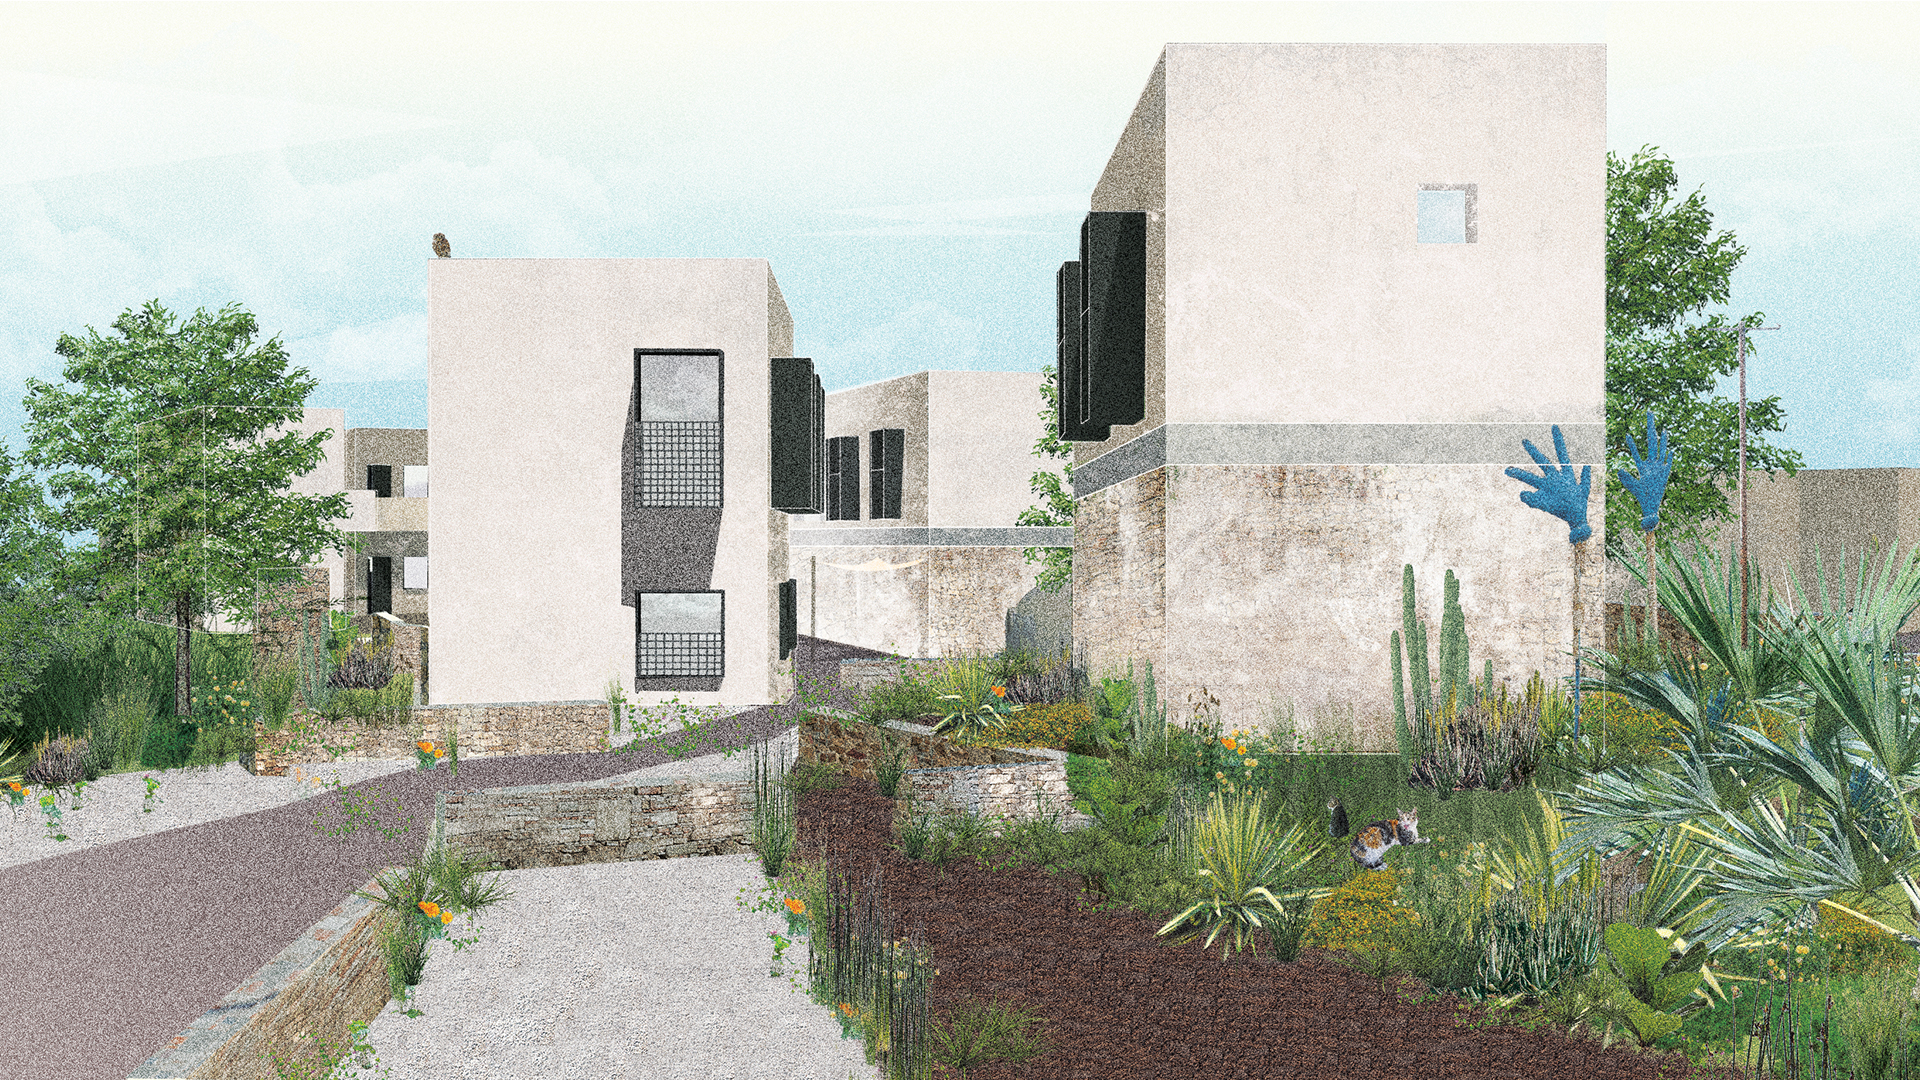 Artists Residence. Elevation.